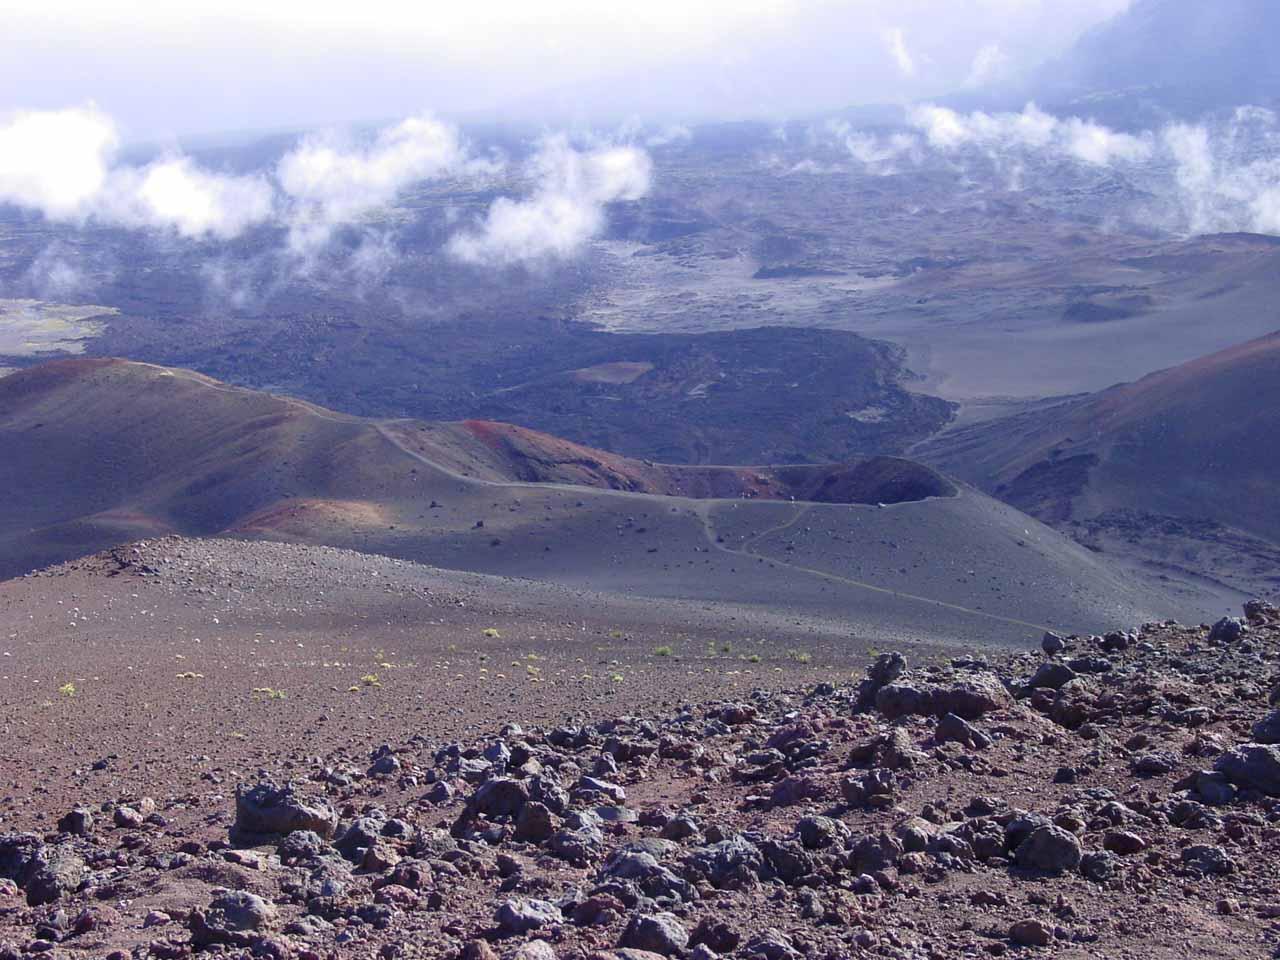 The Haleakala Summit